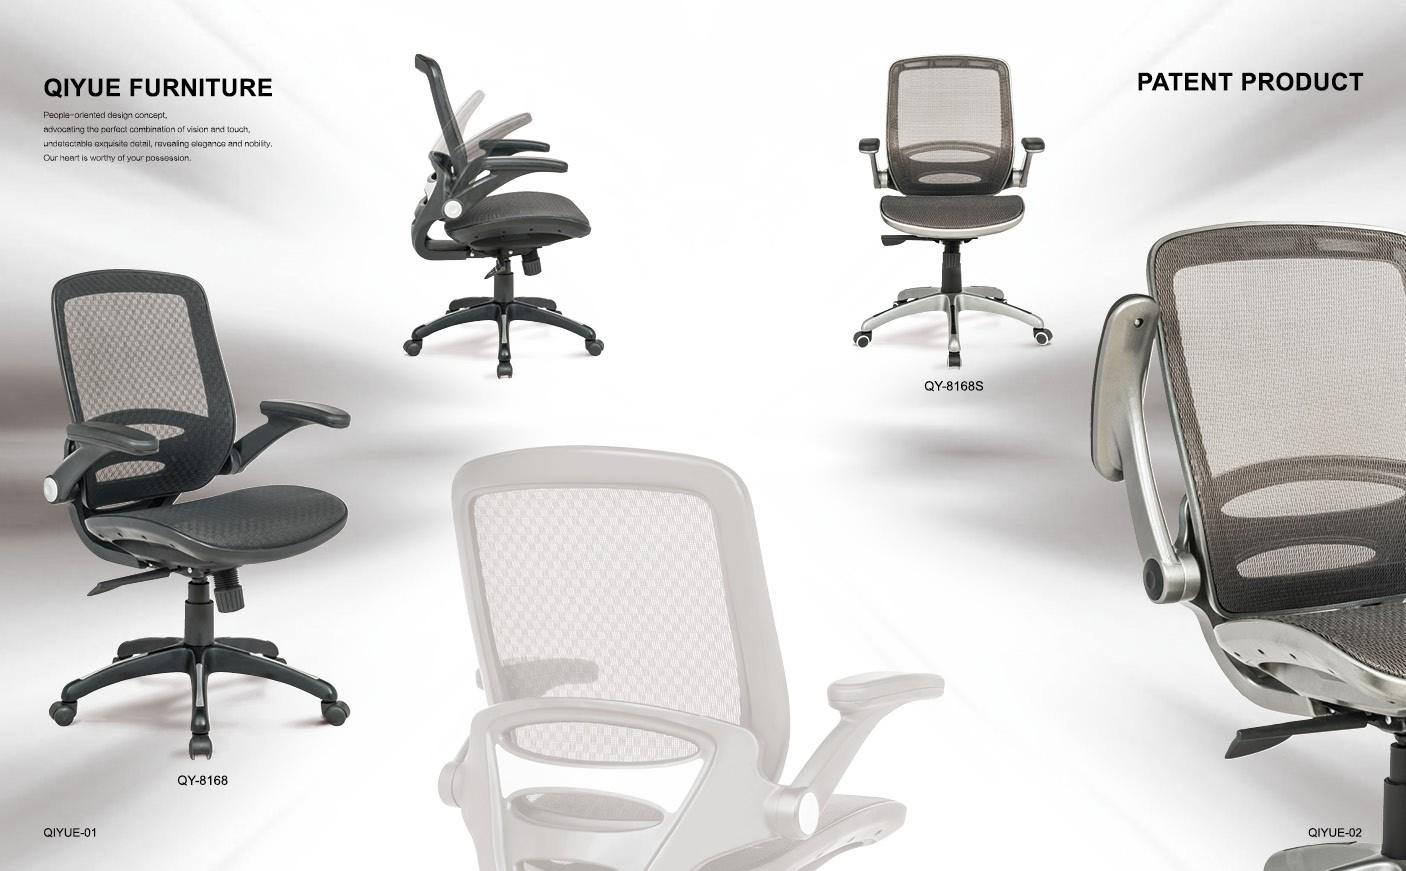 Miraculous Anji Qiyue Furniture Co Ltd Linkedin Alphanode Cool Chair Designs And Ideas Alphanodeonline